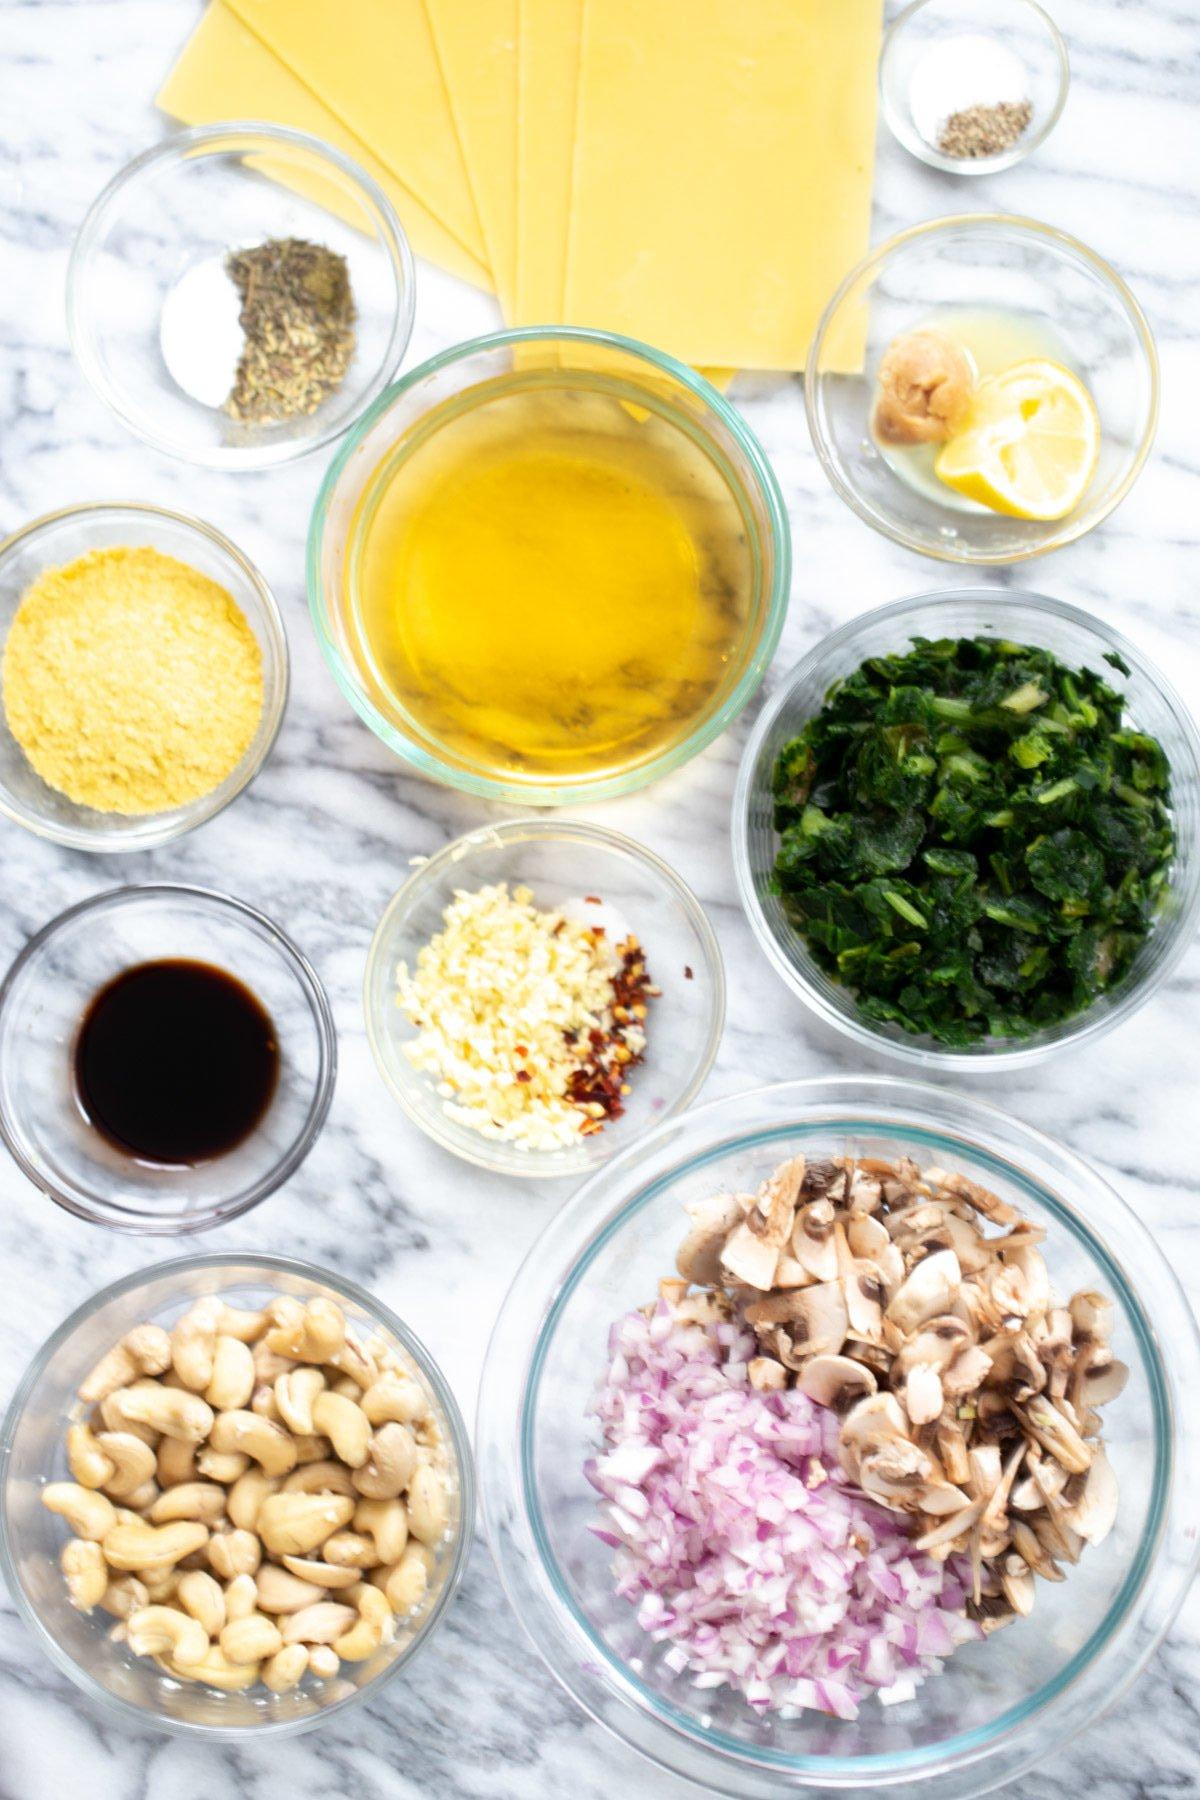 ingredients needed for making vegan skillet lasagna